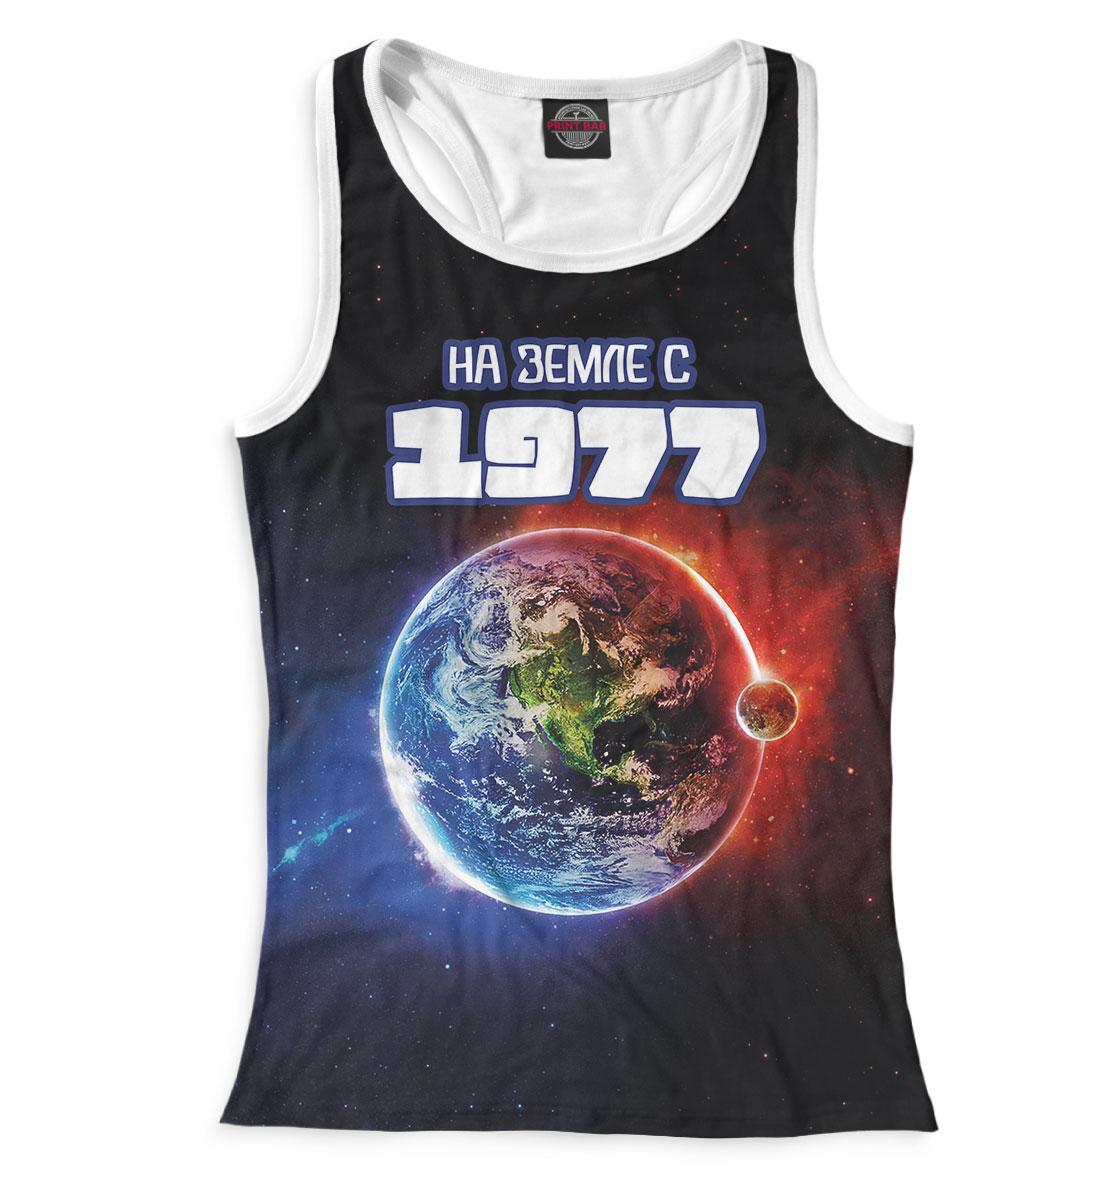 Купить На Земле с 1977, Printbar, Майки борцовки, DSE-631472-mayb-1